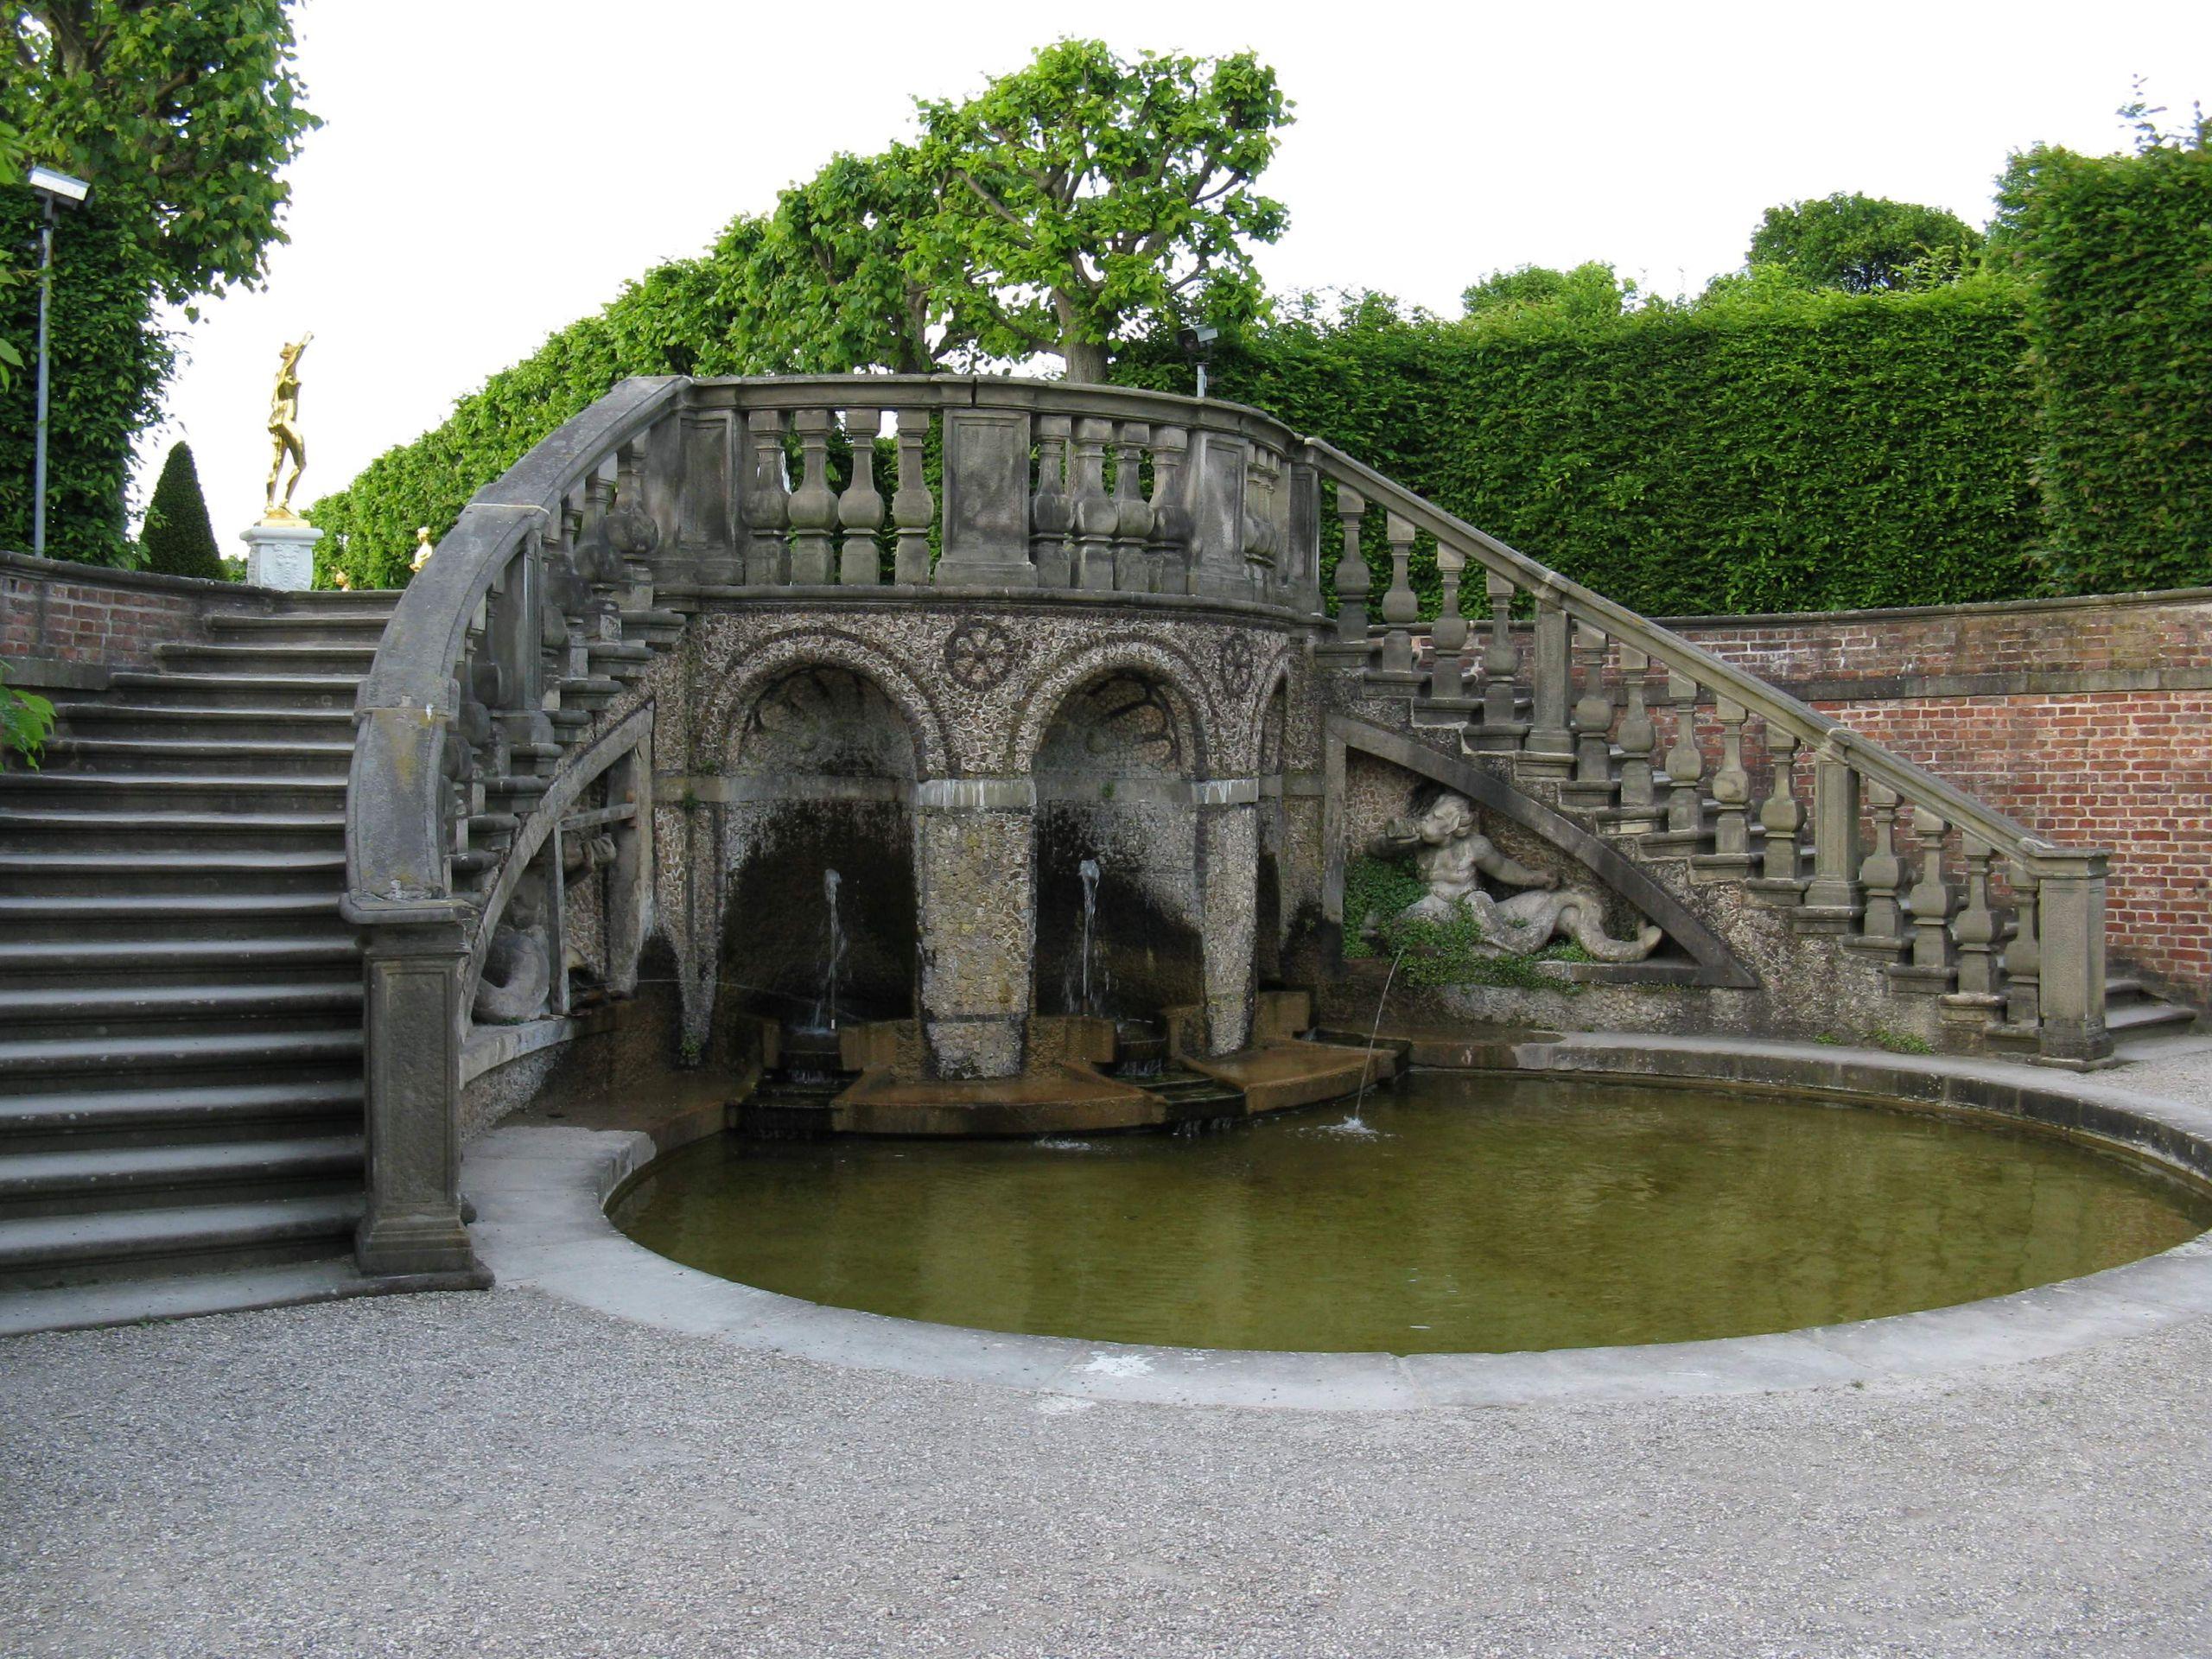 Herrenhäuser Gärten Genial File Hannover Herrenhausen Großer Garten Treppe Zum